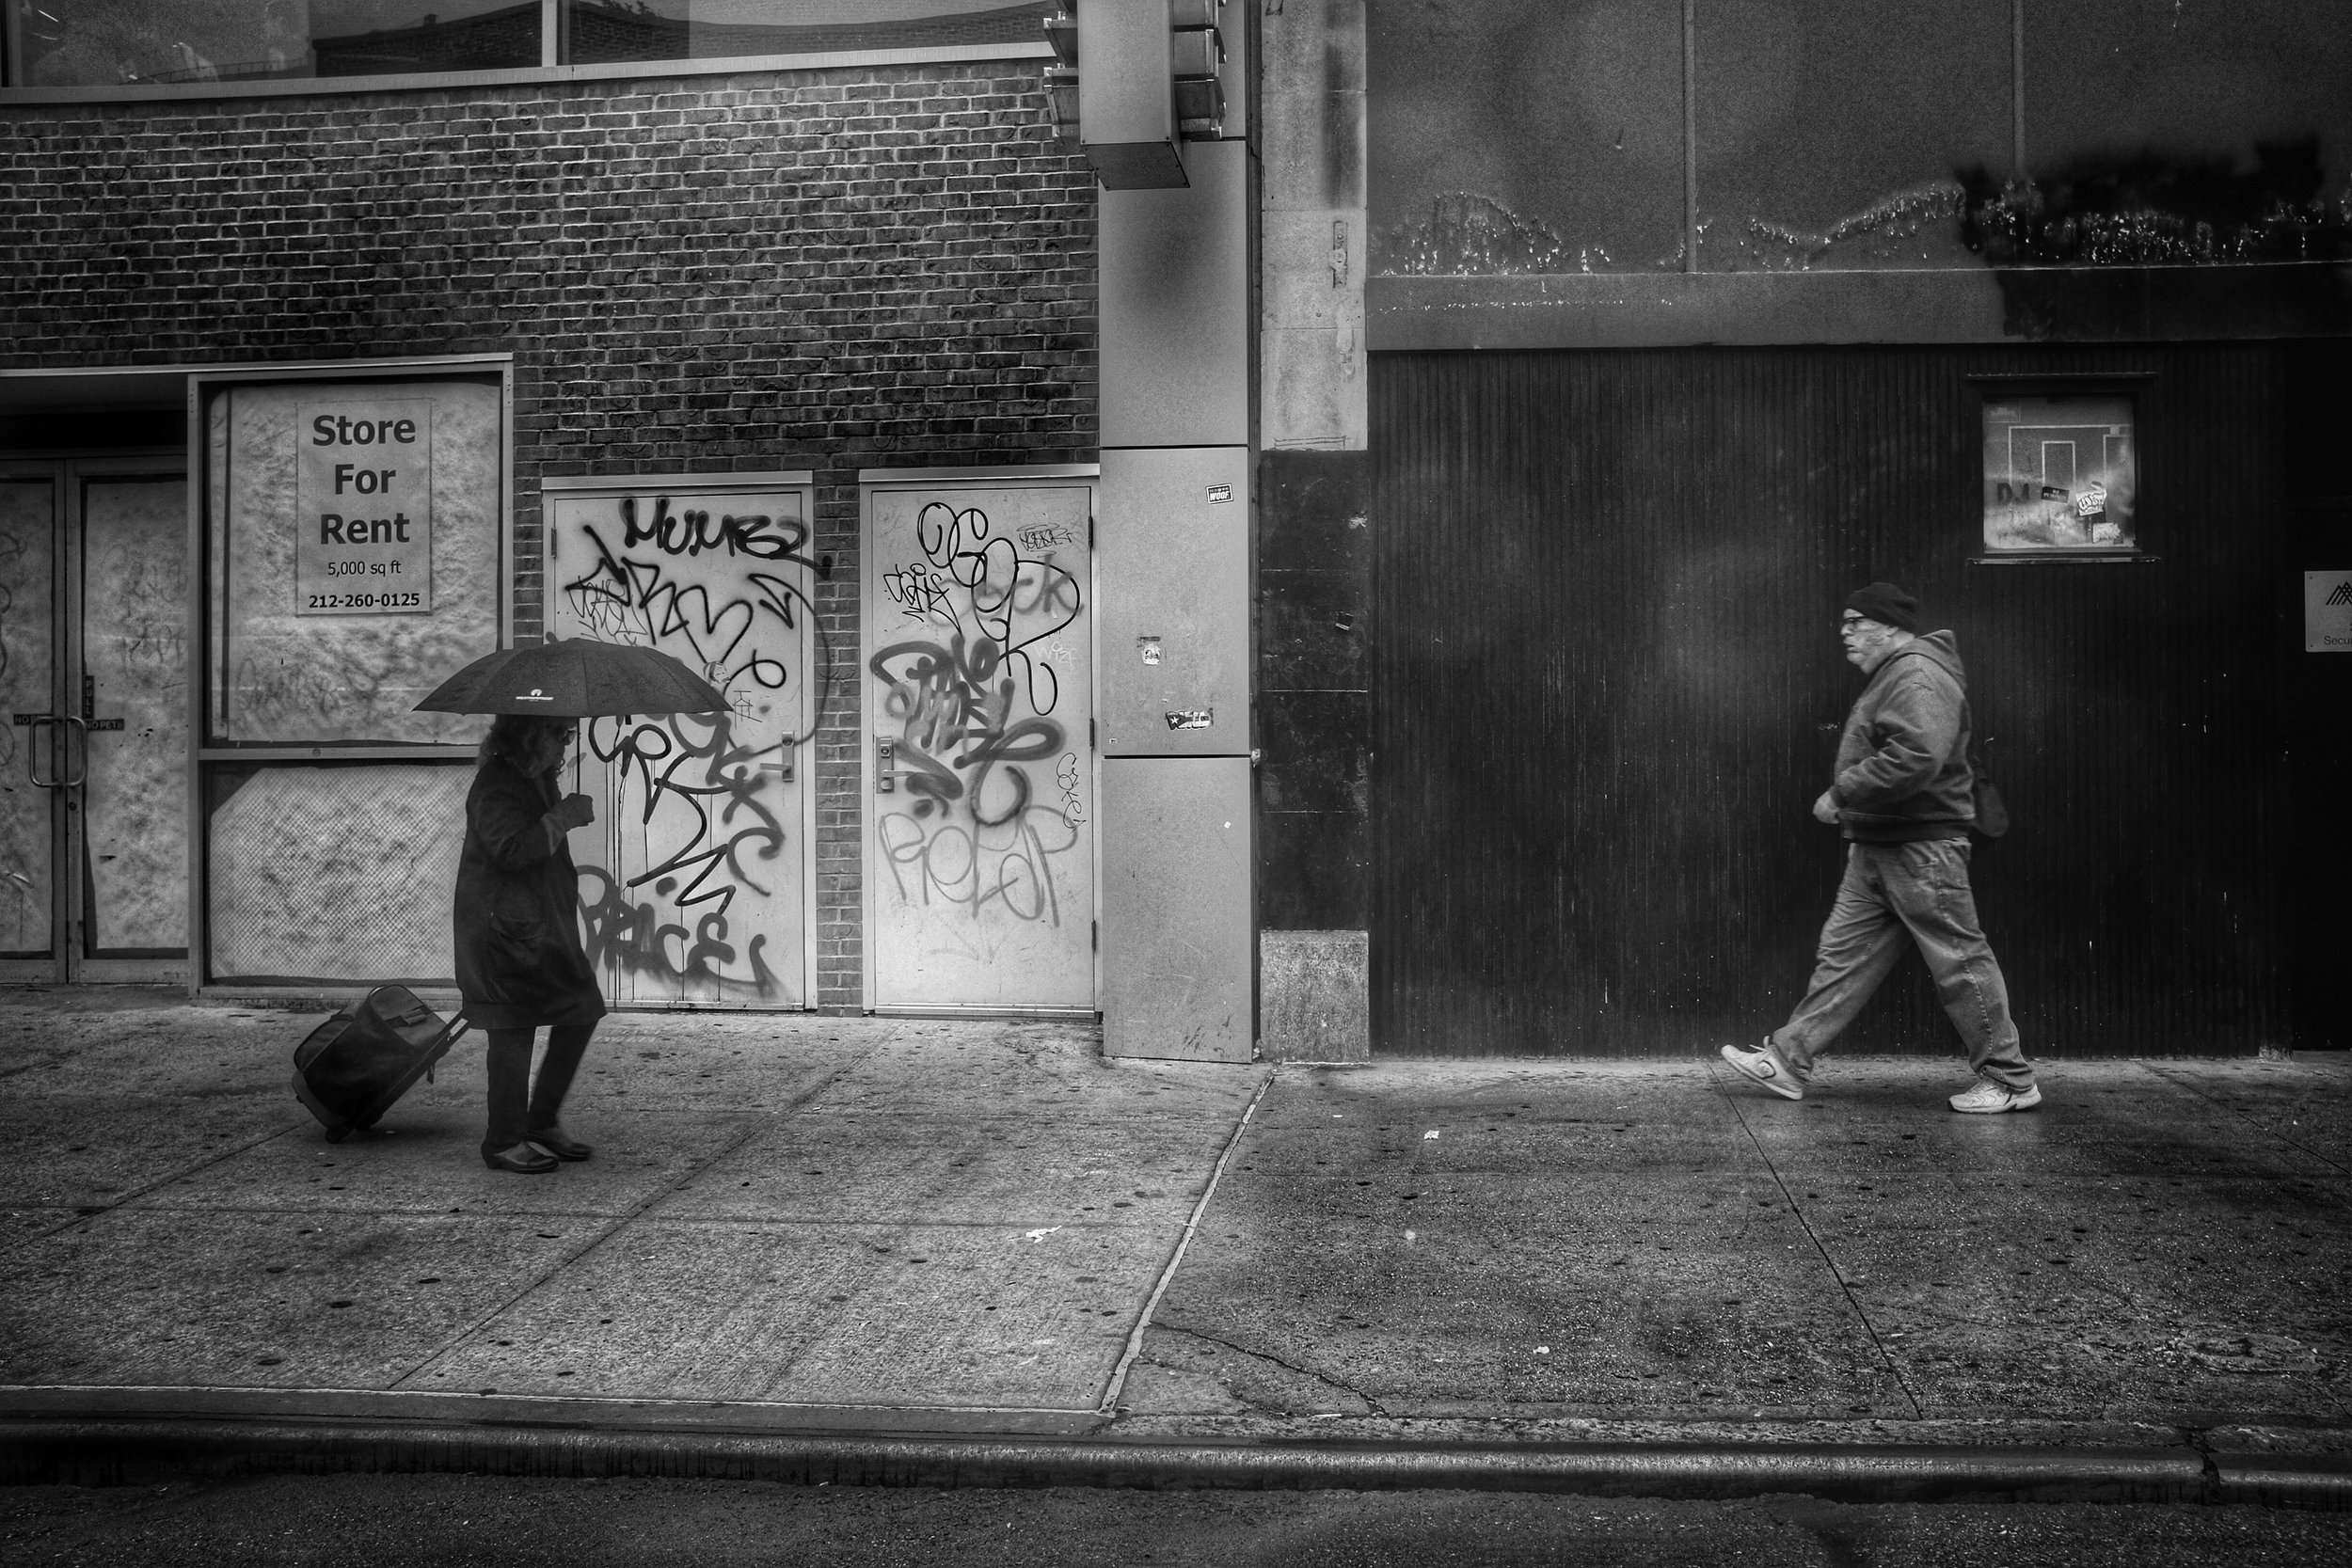 Avenue A. East Village. Manhattan. New York City. 2016.